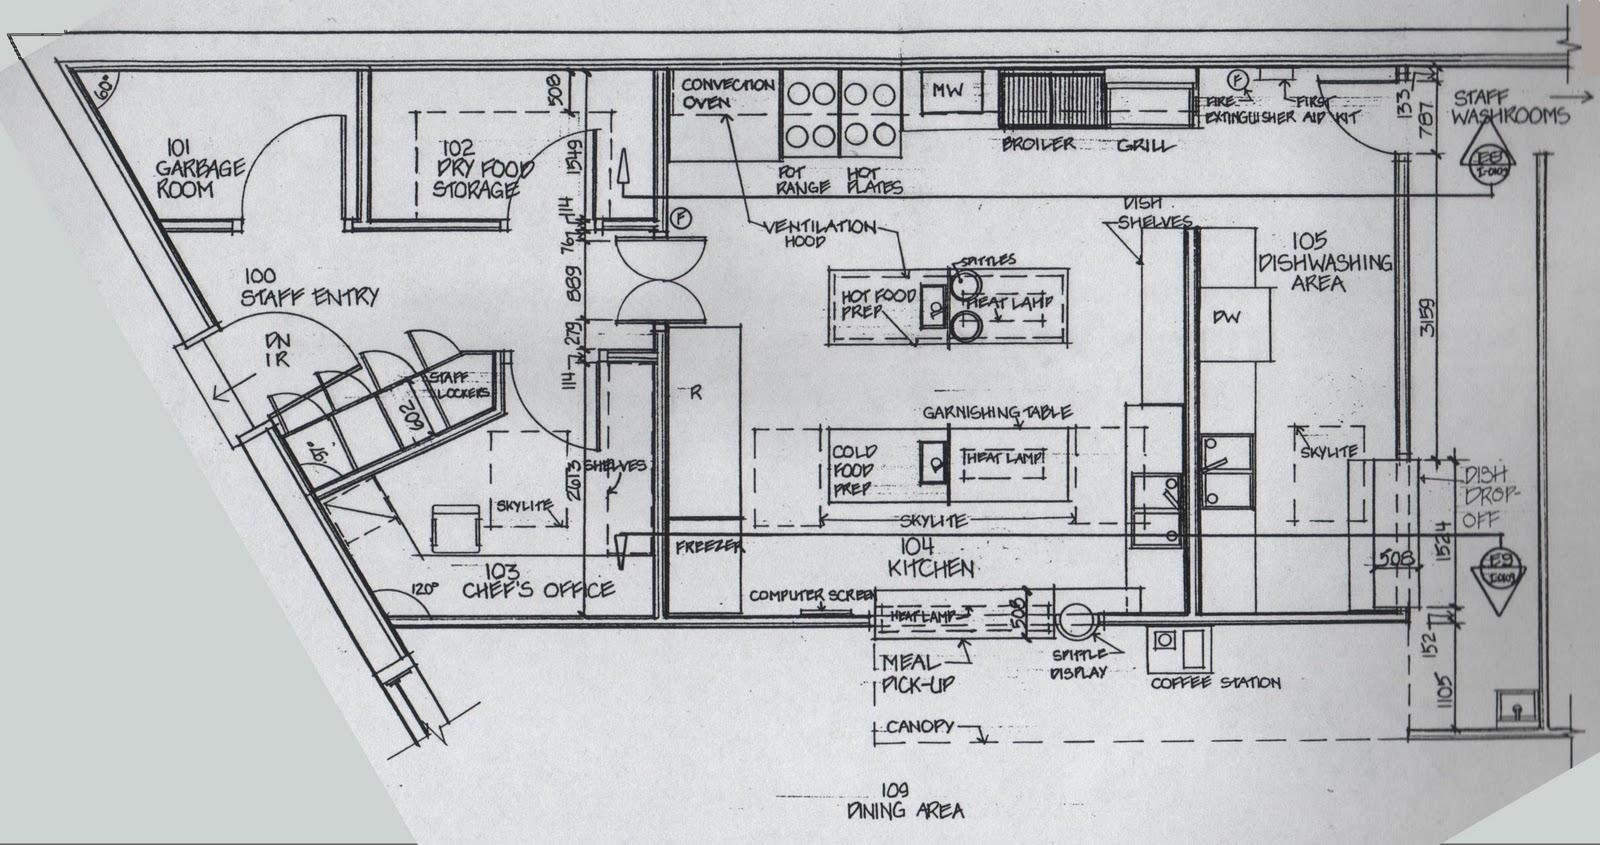 Restaurant Design  SC Design  Drafting